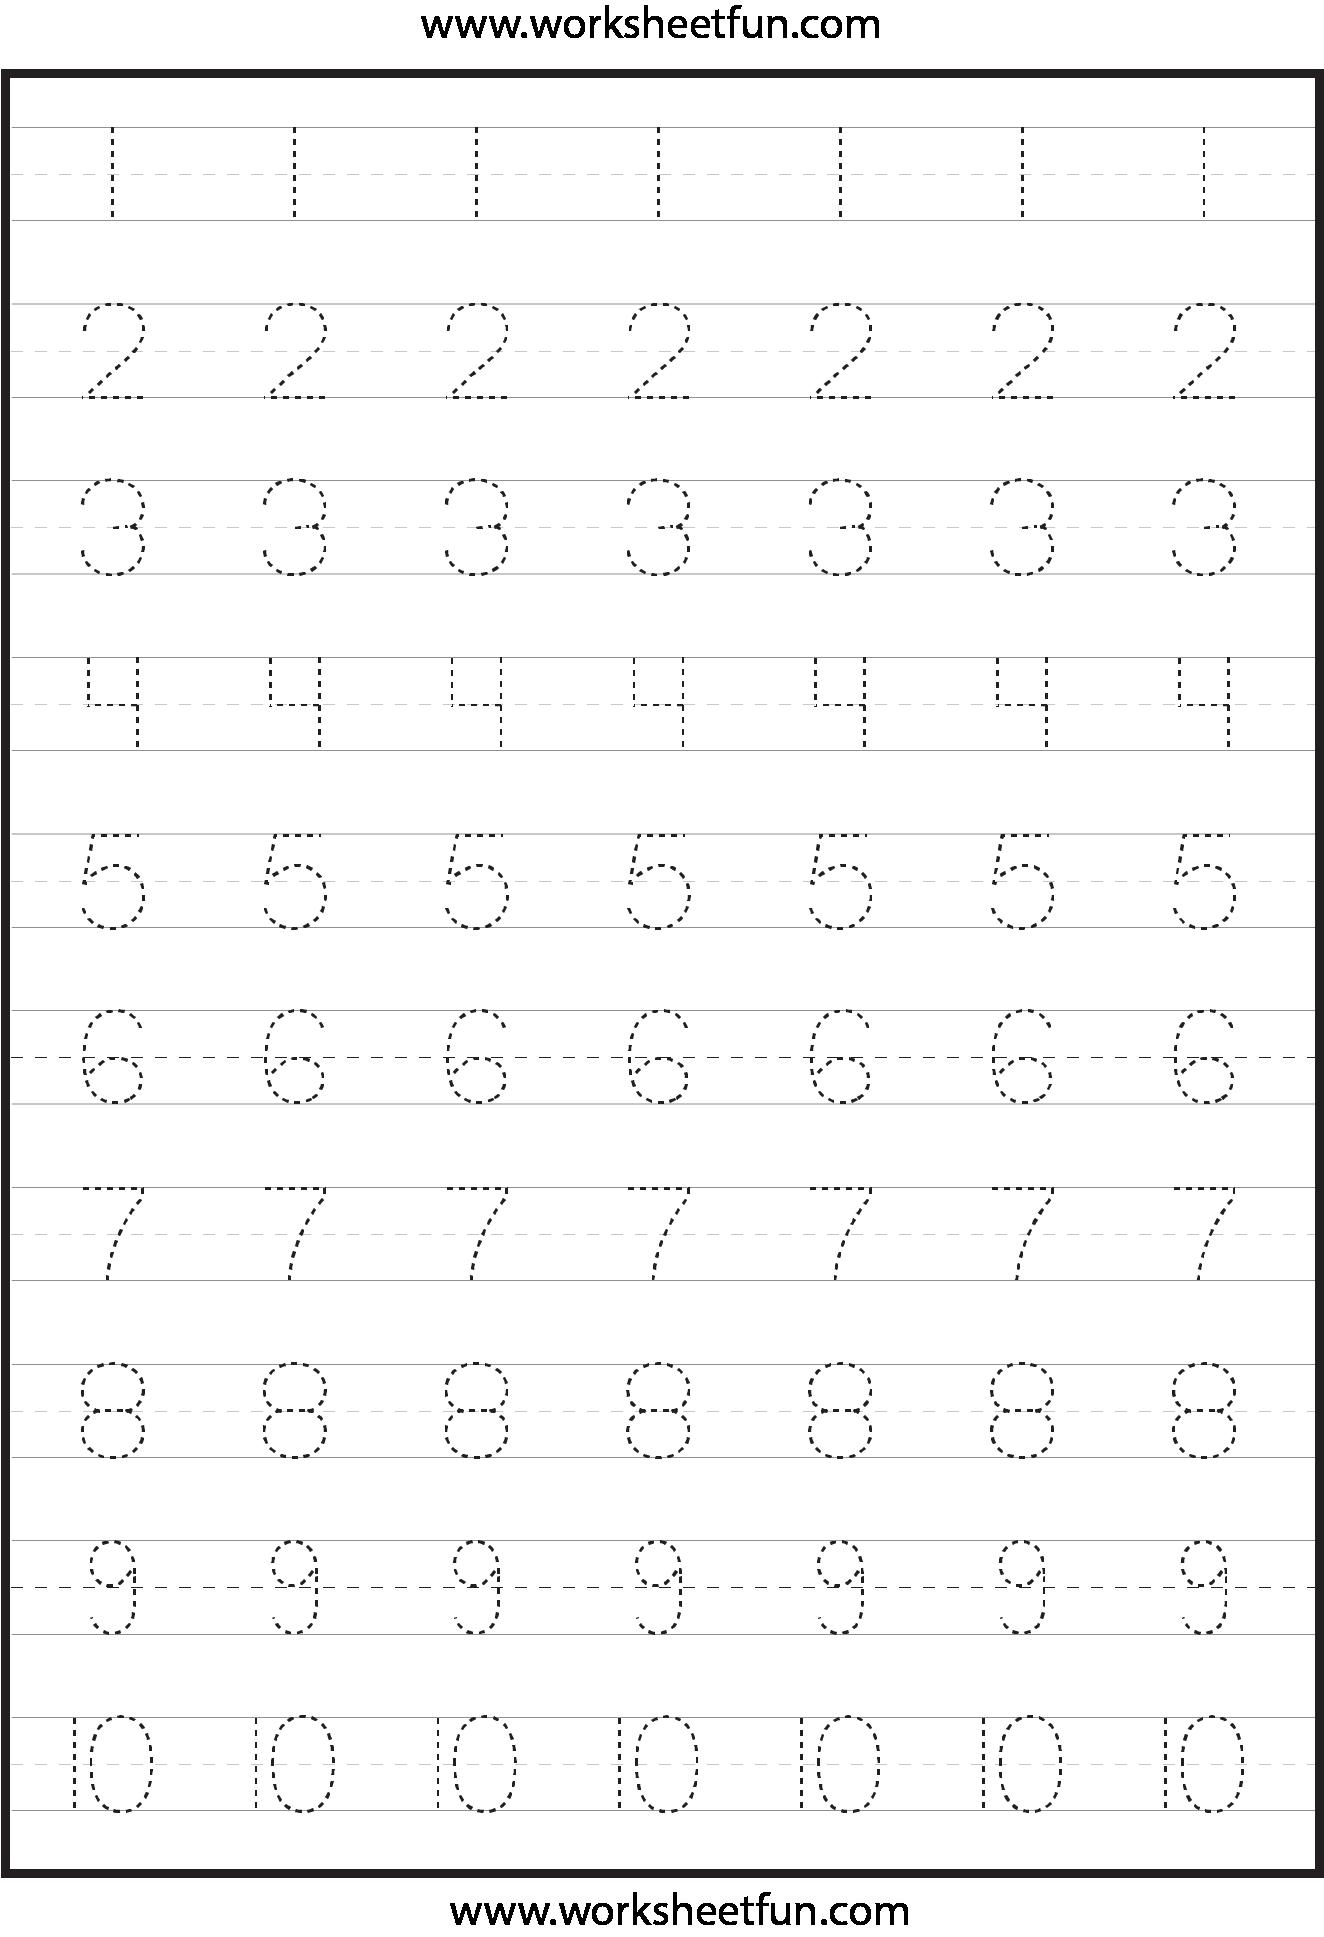 math worksheet : 7 best images of free printable worksheets numbers 1 10  : Kindergarten Number Worksheets 1 10